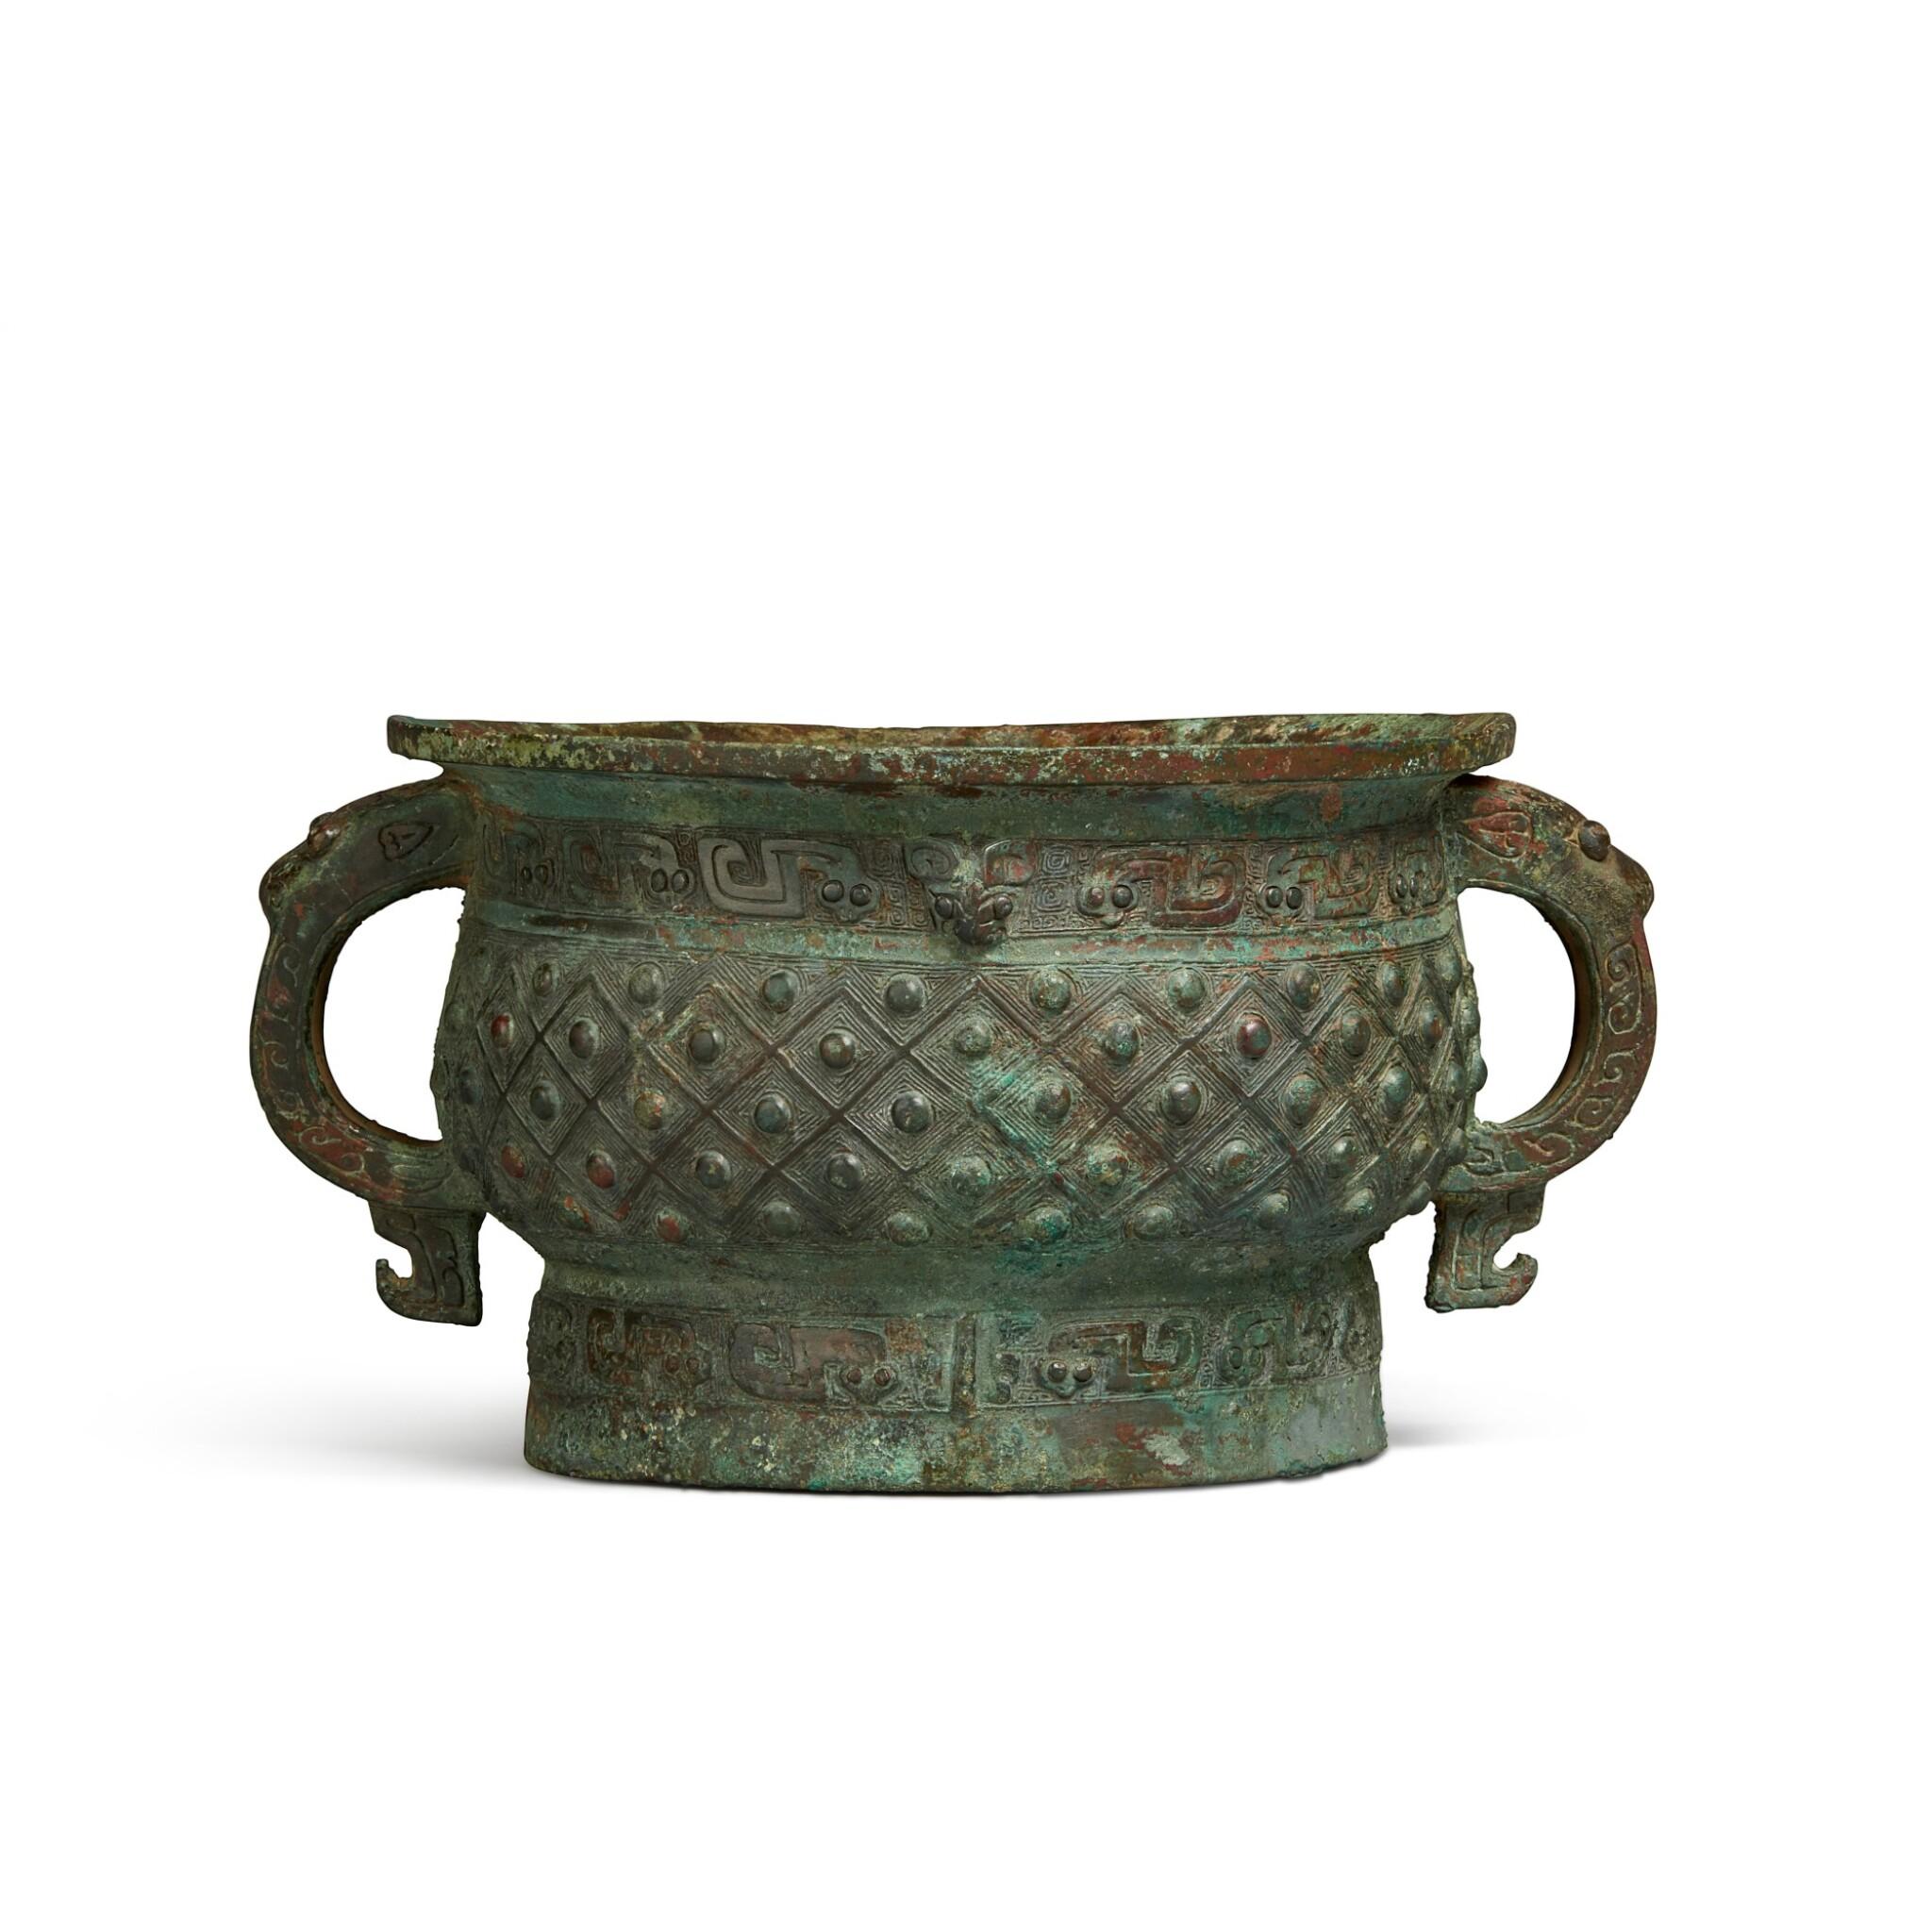 View full screen - View 1 of Lot 13. An archaic bronze ritual food vessel (Gui), Early Western Zhou dynasty | 西周初 旅簋.